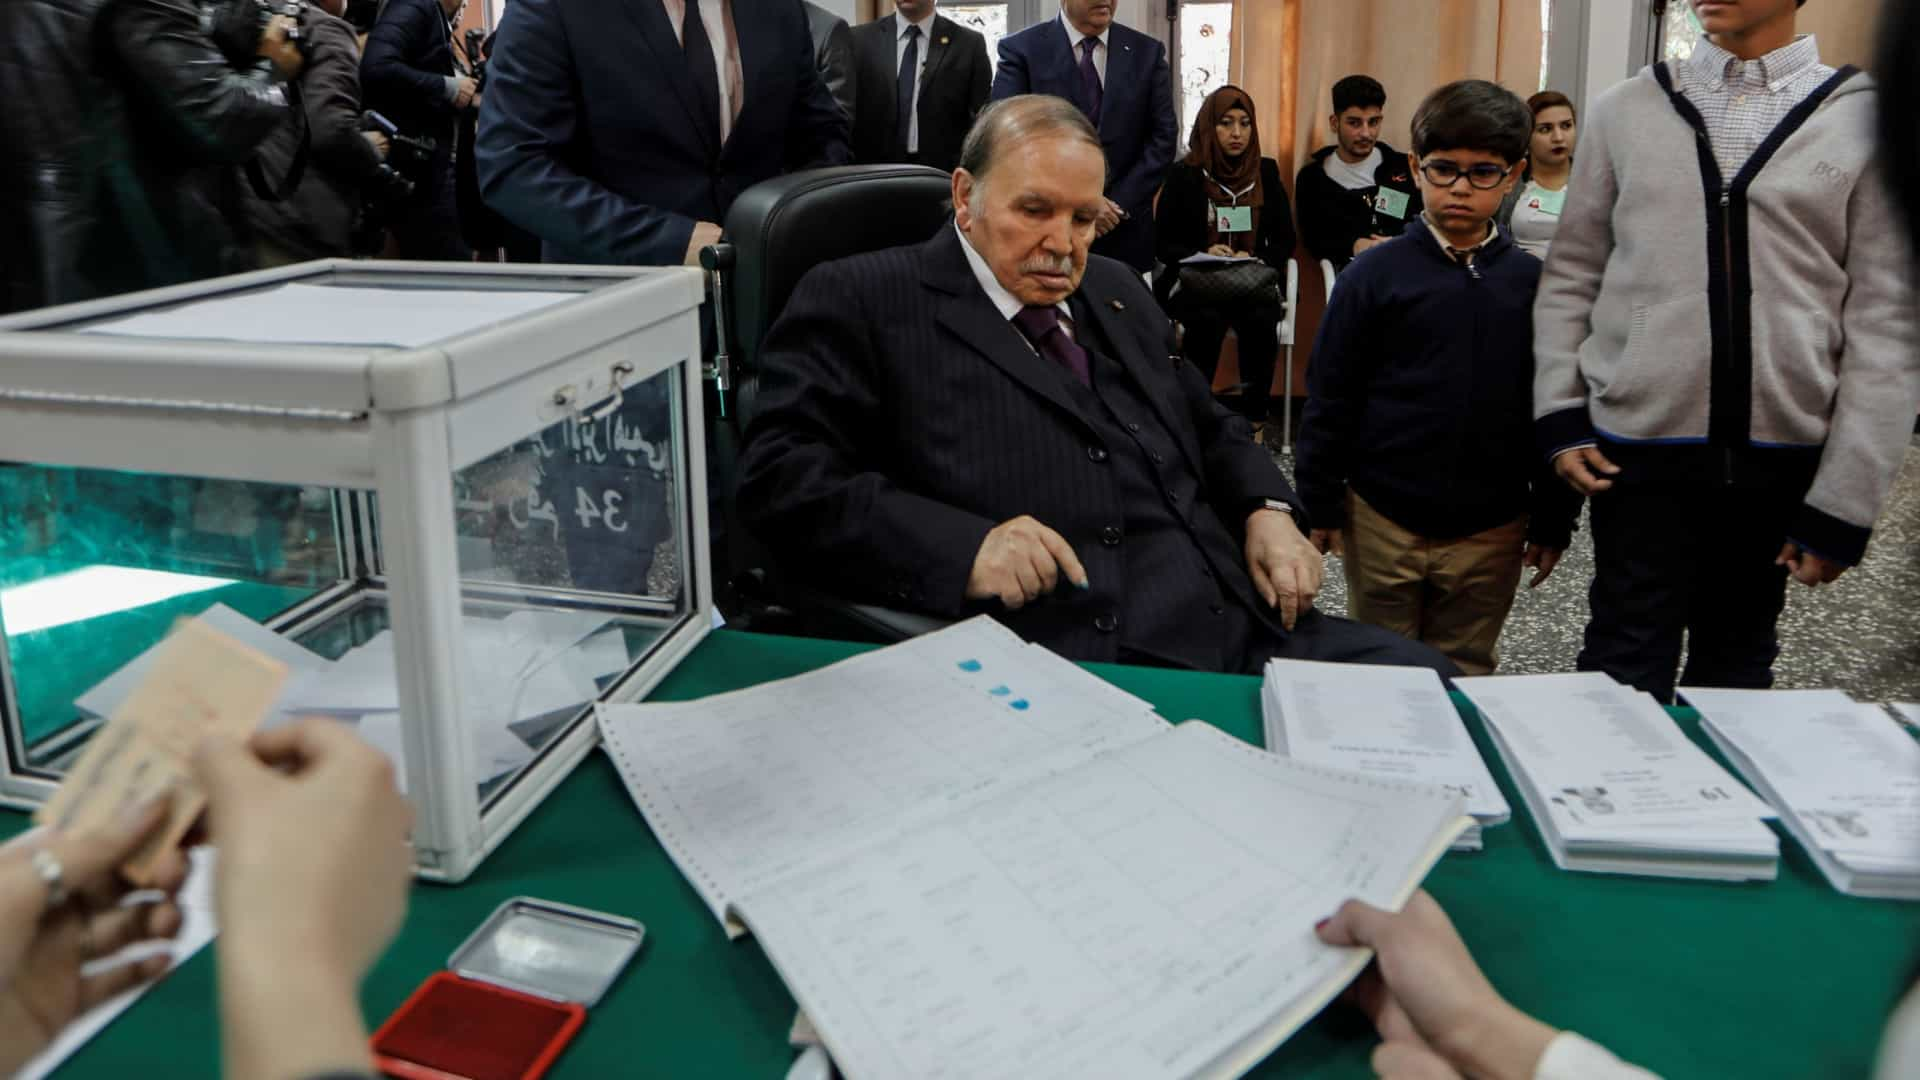 após protestos, presidente argelino anuncia que não se vai recandidatar - Abdelaziz Bouteflika - Após protestos, presidente argelino anuncia que não se vai recandidatar